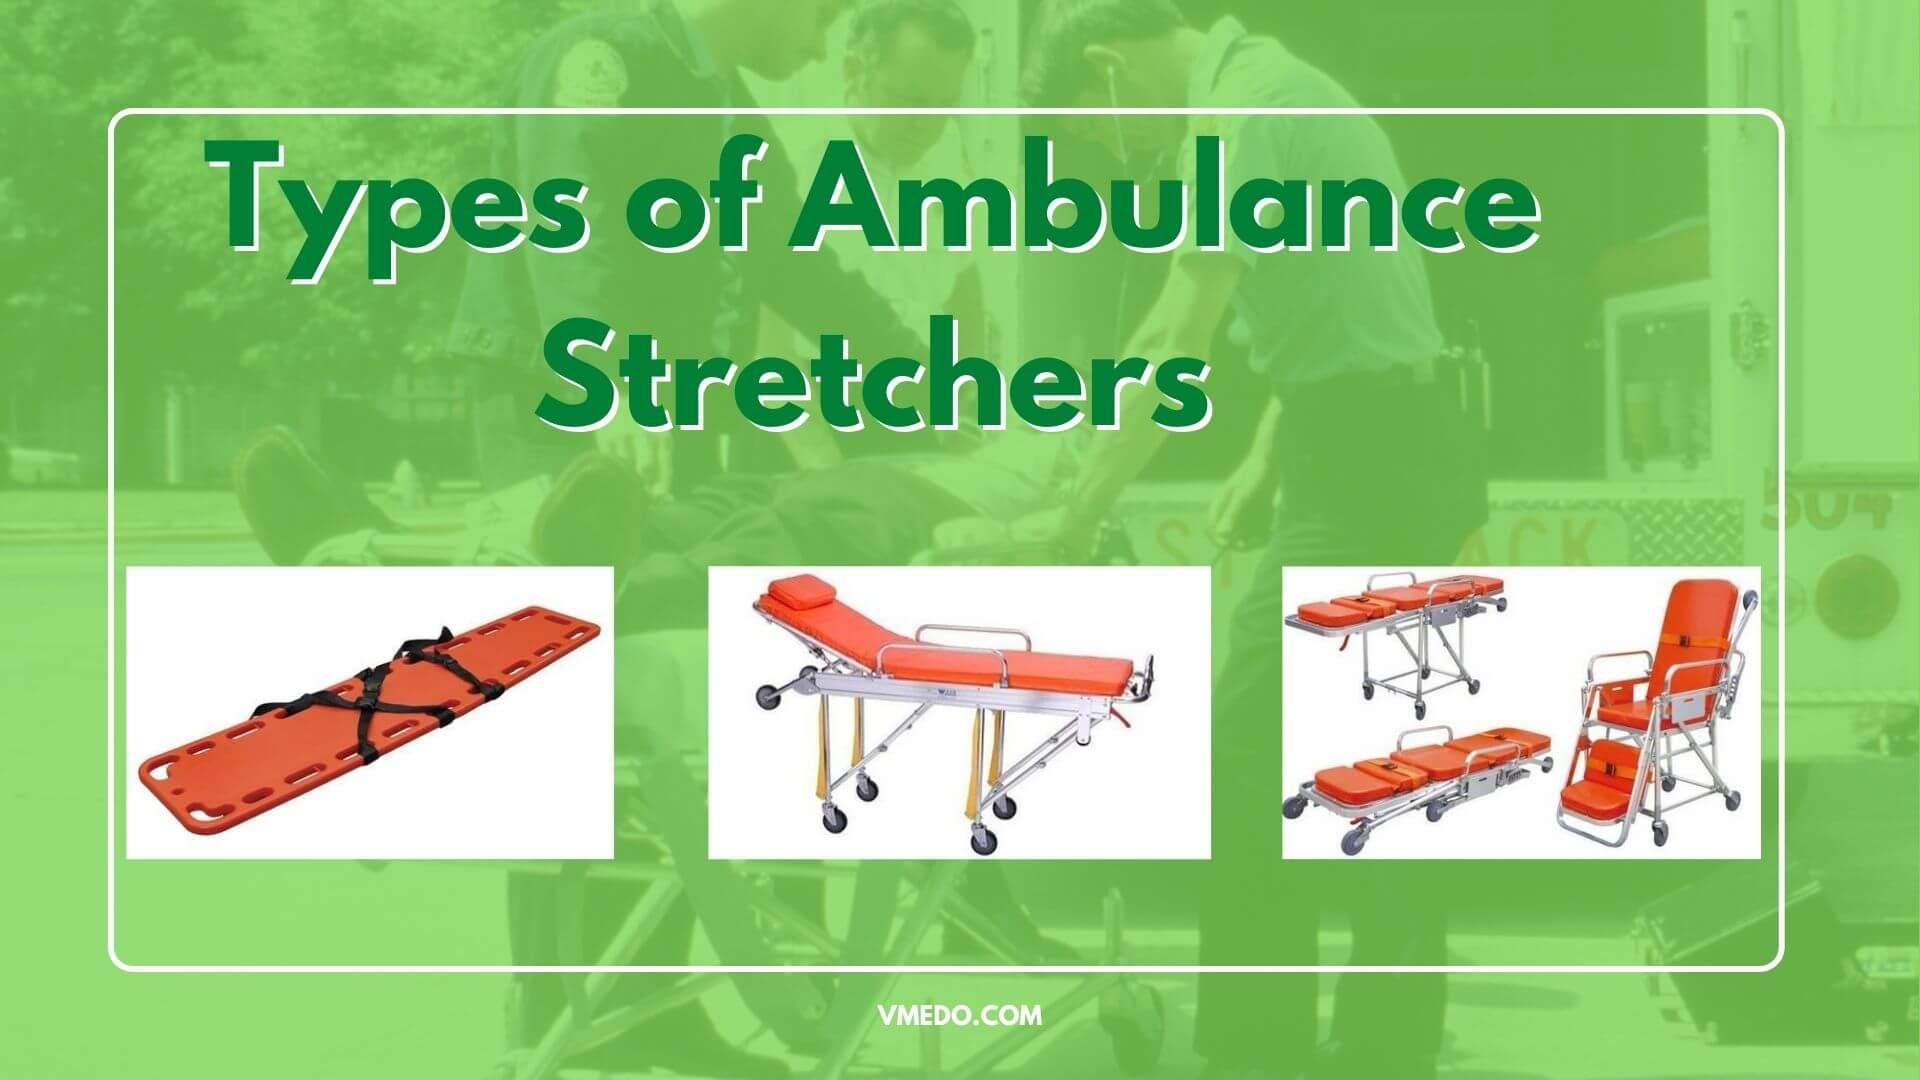 Types of ambulance stretchers